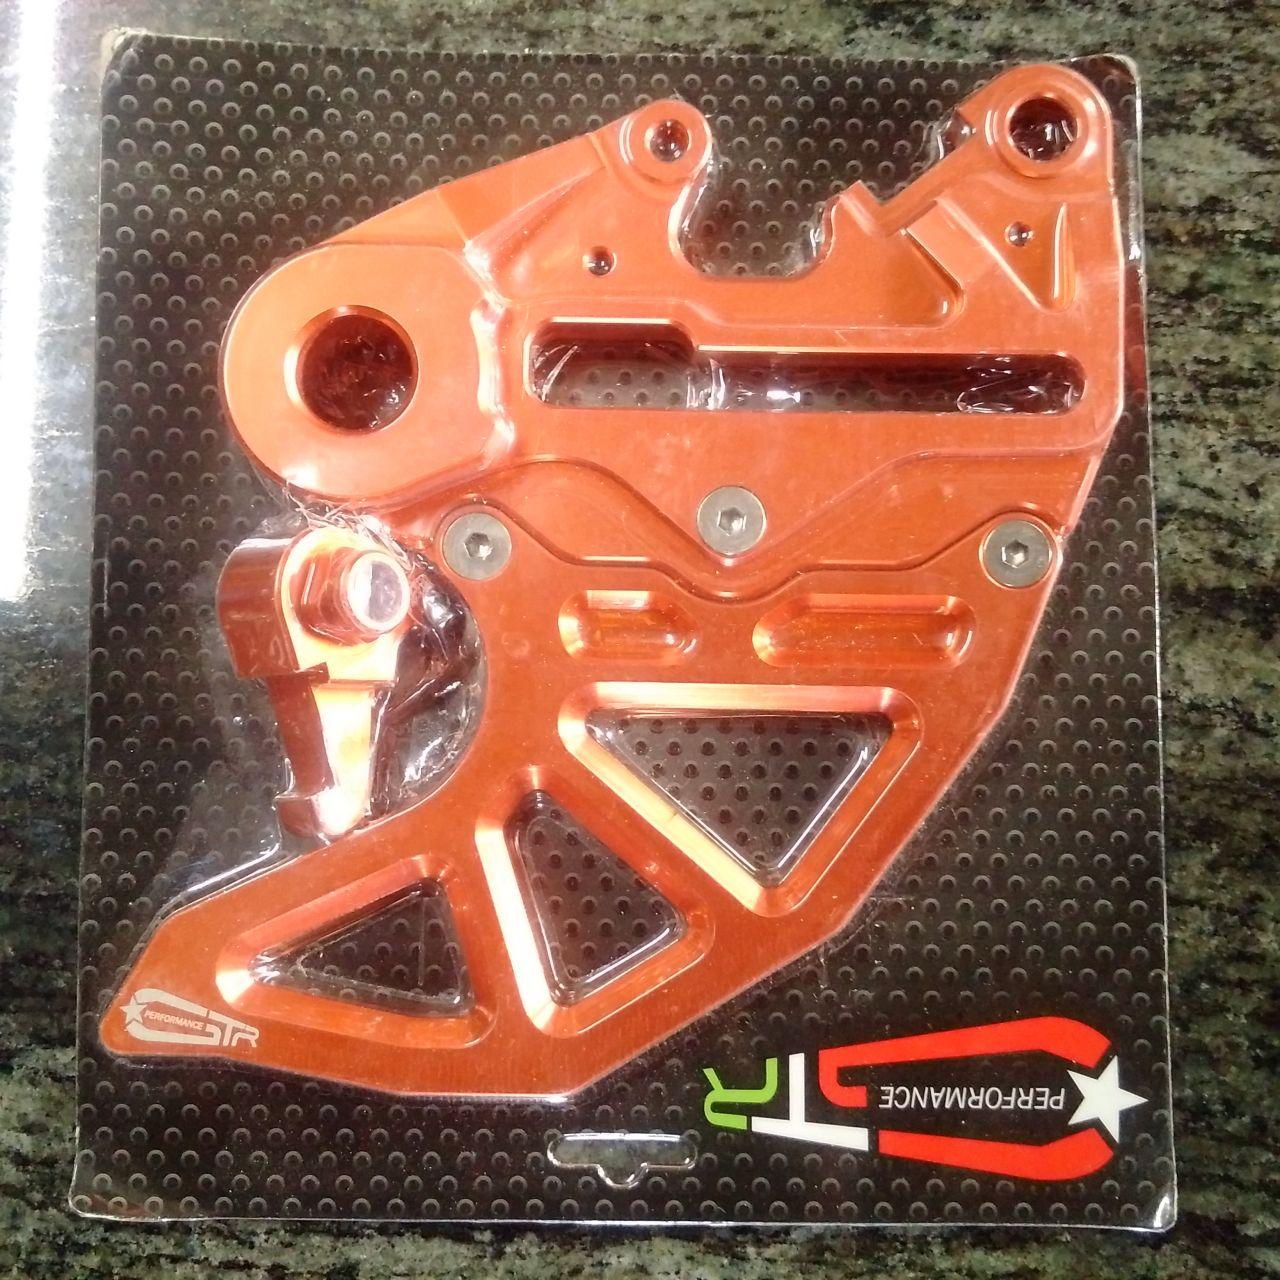 wpid wp 1479377295153 JualDiskguard belakang KTM 250,350,450,500cc merk GTR performance Rp.1,800,000 diskon 30% dari harga awal untuk semua motor ktm